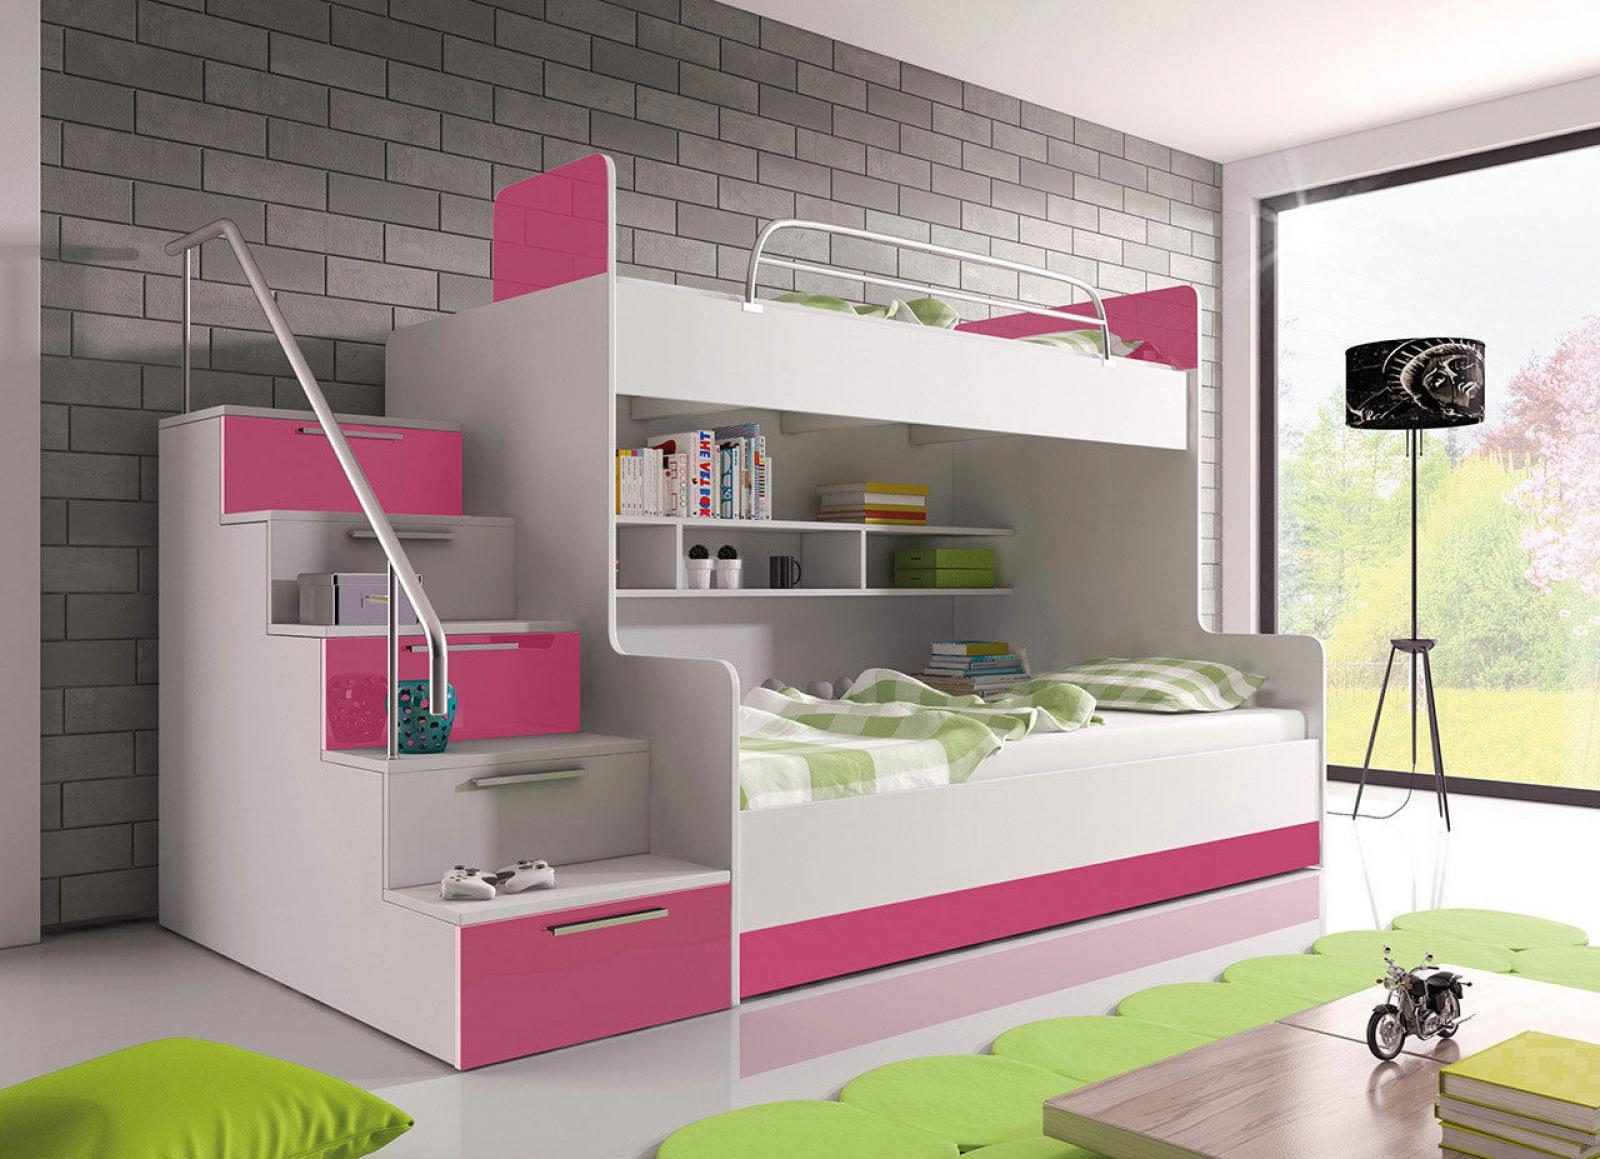 kaufexpert doppelstockbett rosa hochglanz links etagenbett hochglanz kinderbett bett kinder. Black Bedroom Furniture Sets. Home Design Ideas